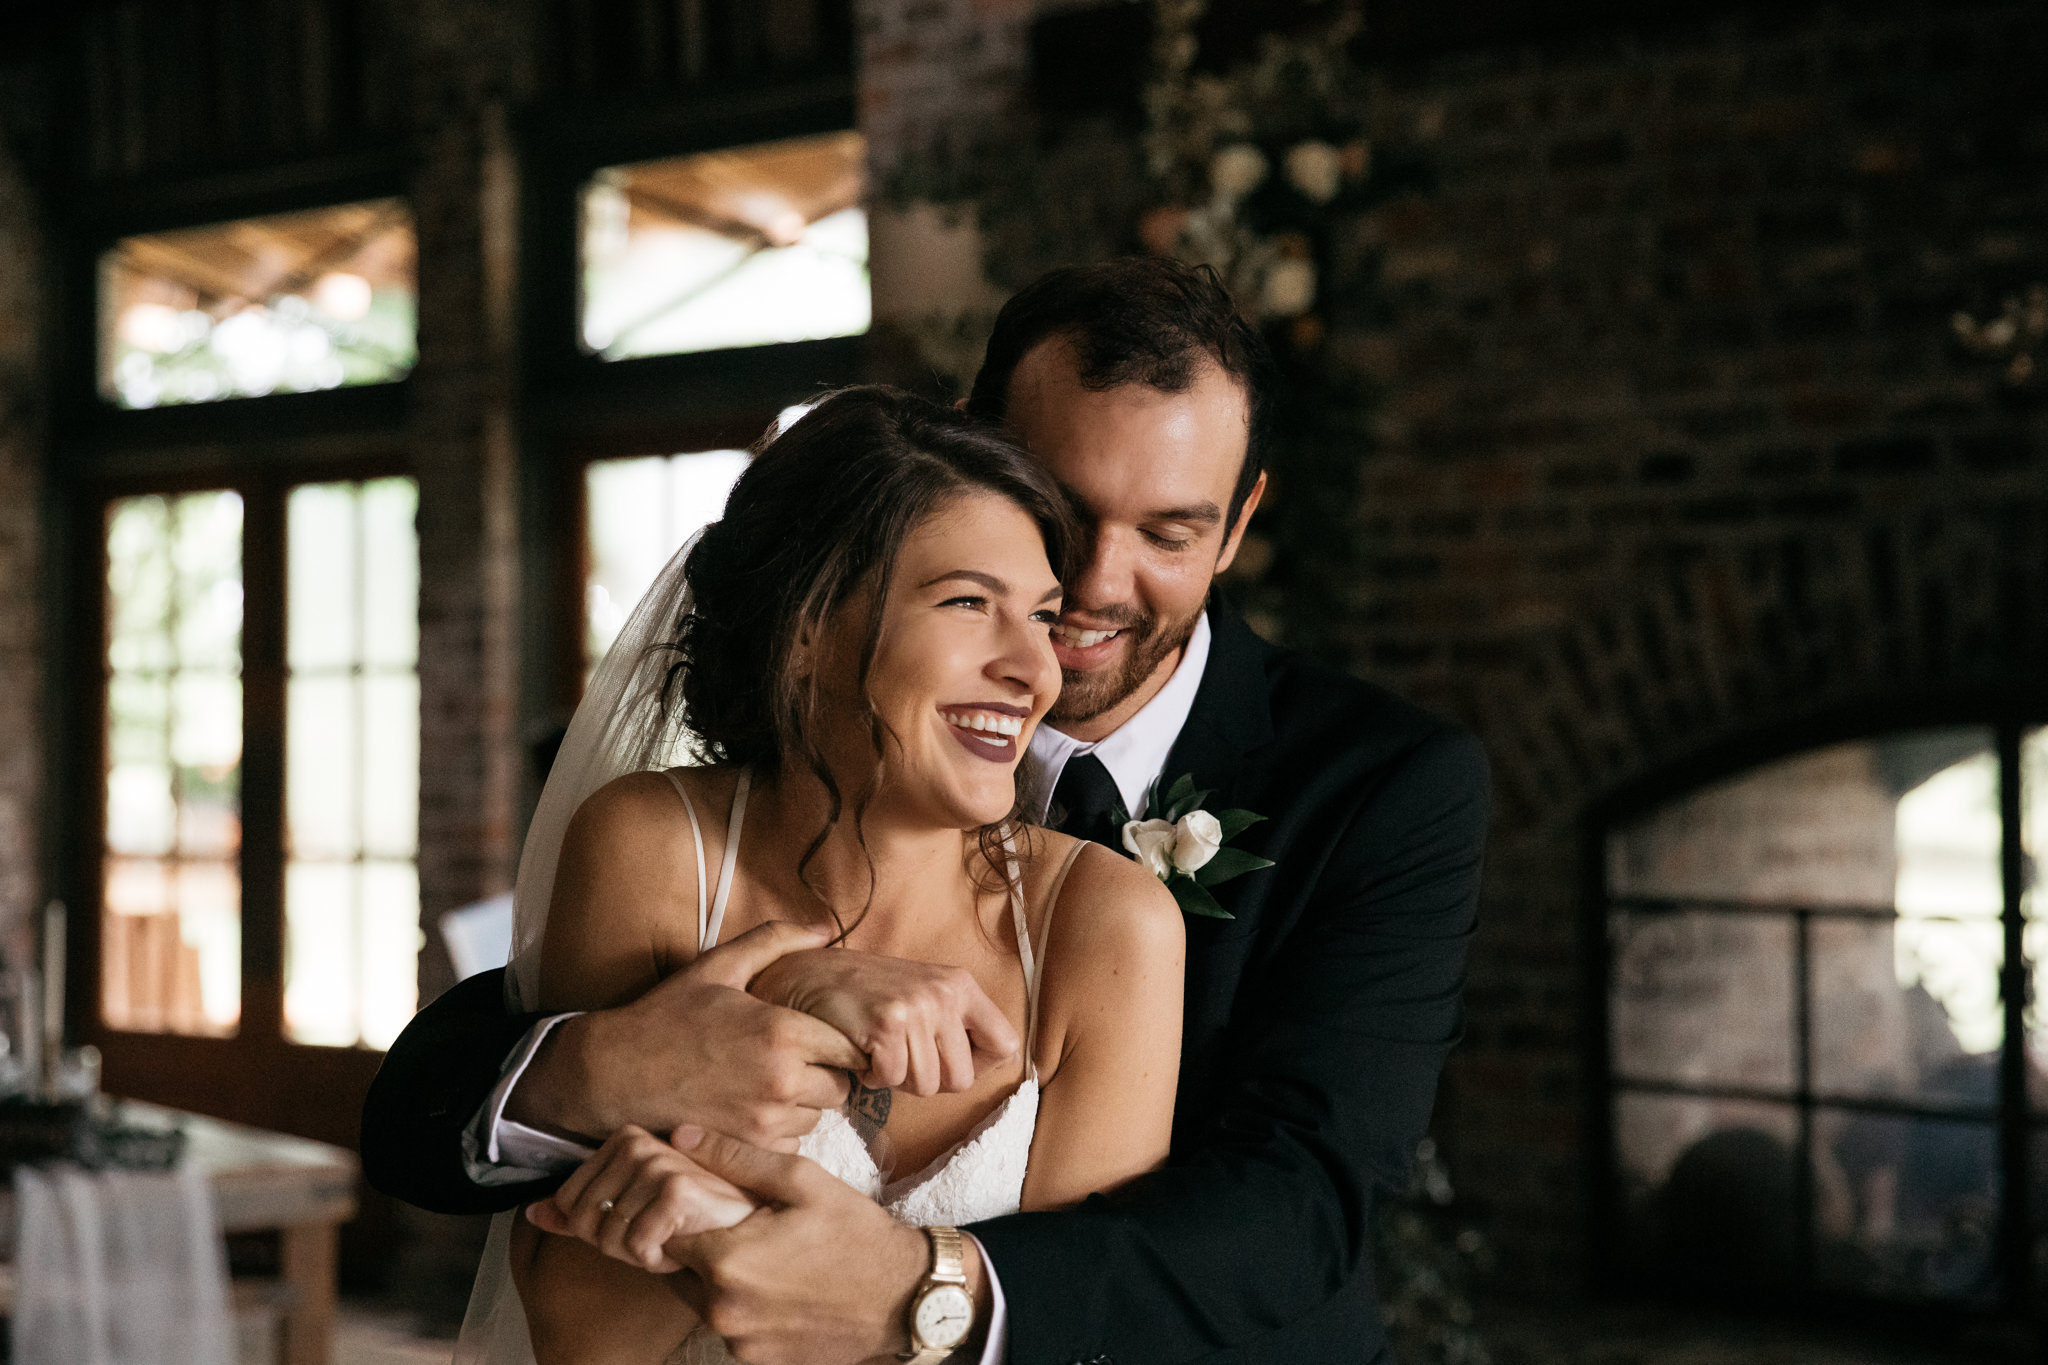 phantom-canyon-brewery-colorado-springs-wedding-photographer-297.jpg